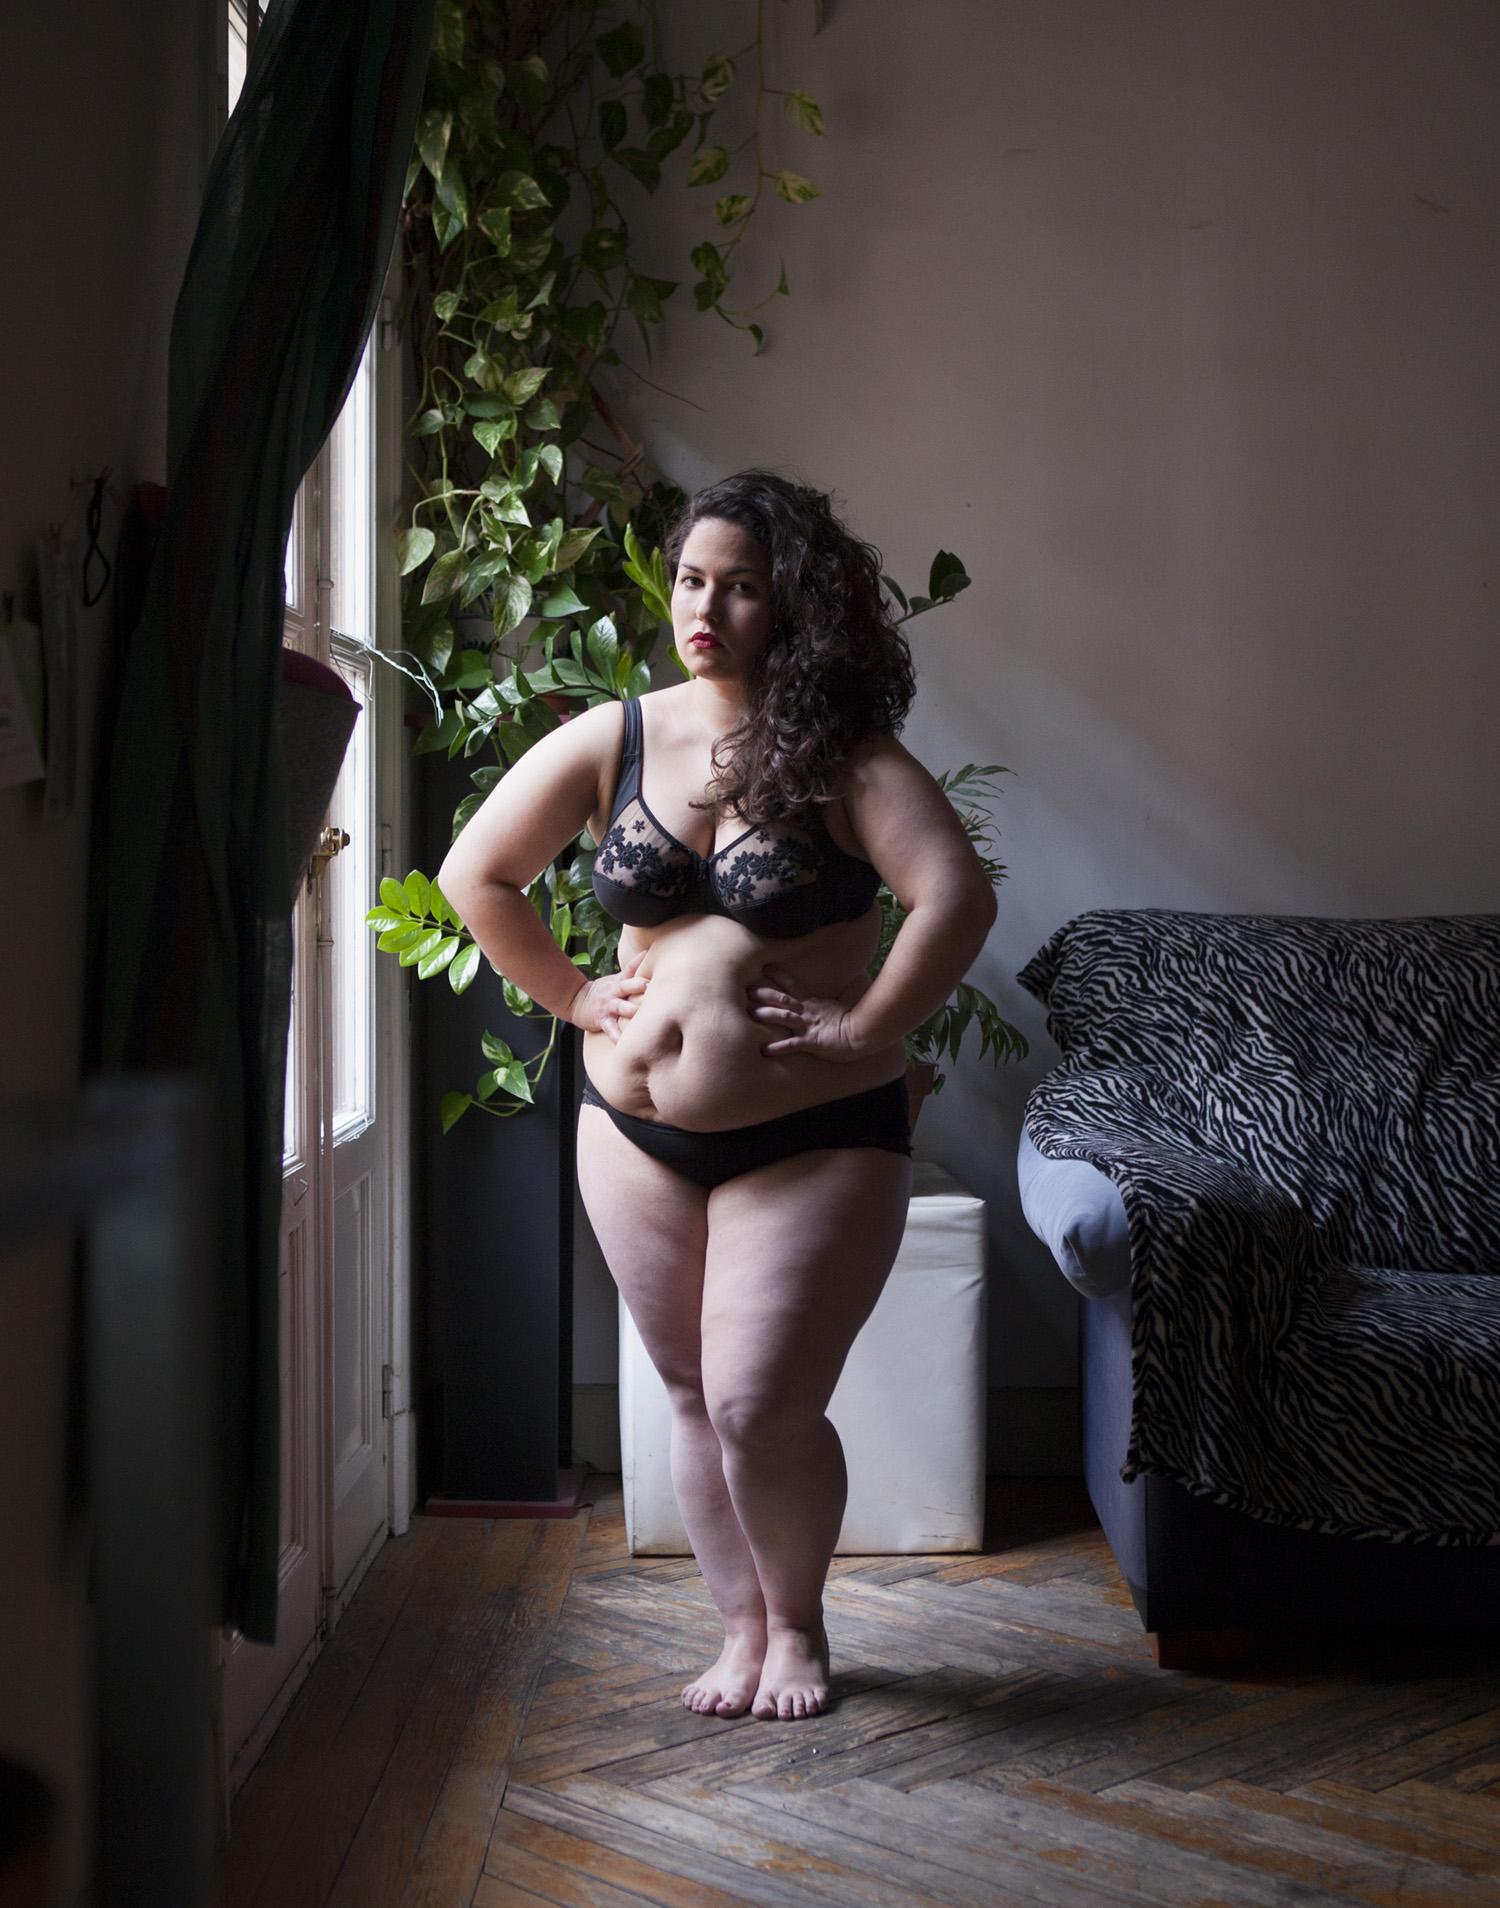 maria_artiaga_07, parquet, planta, sofa, lenceria, mujer